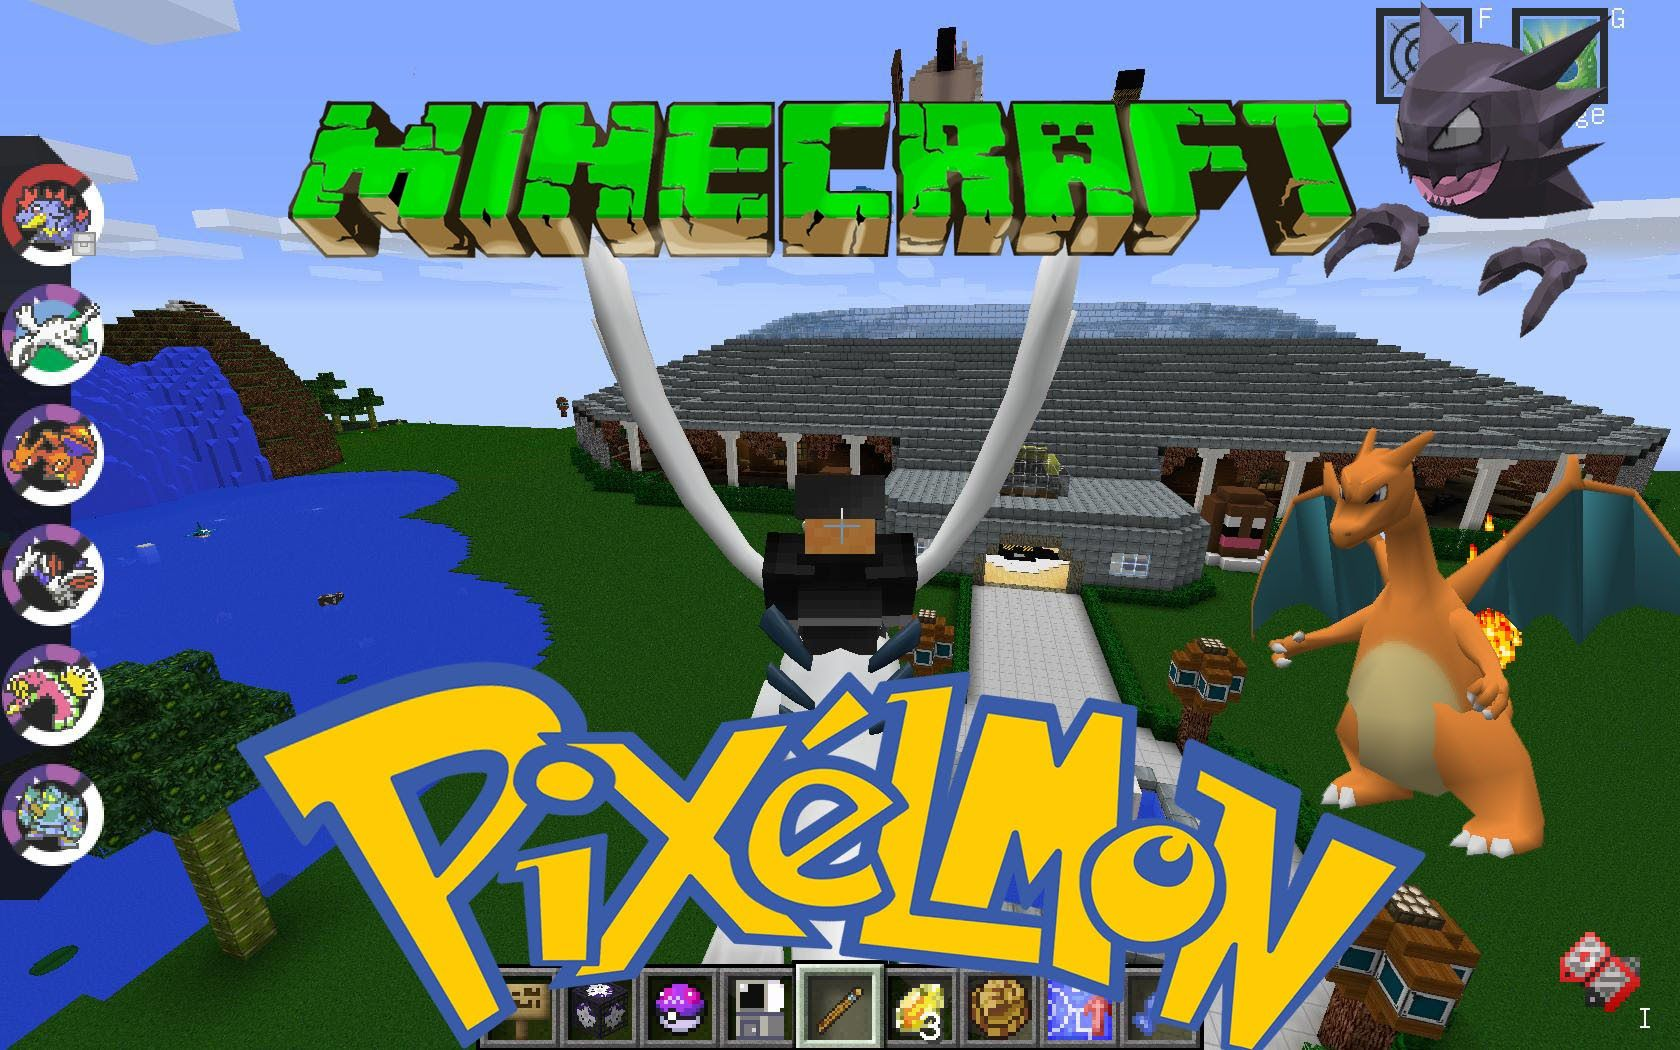 Minecraft pixelmon emerald #21 'the best pixelmon server' w.